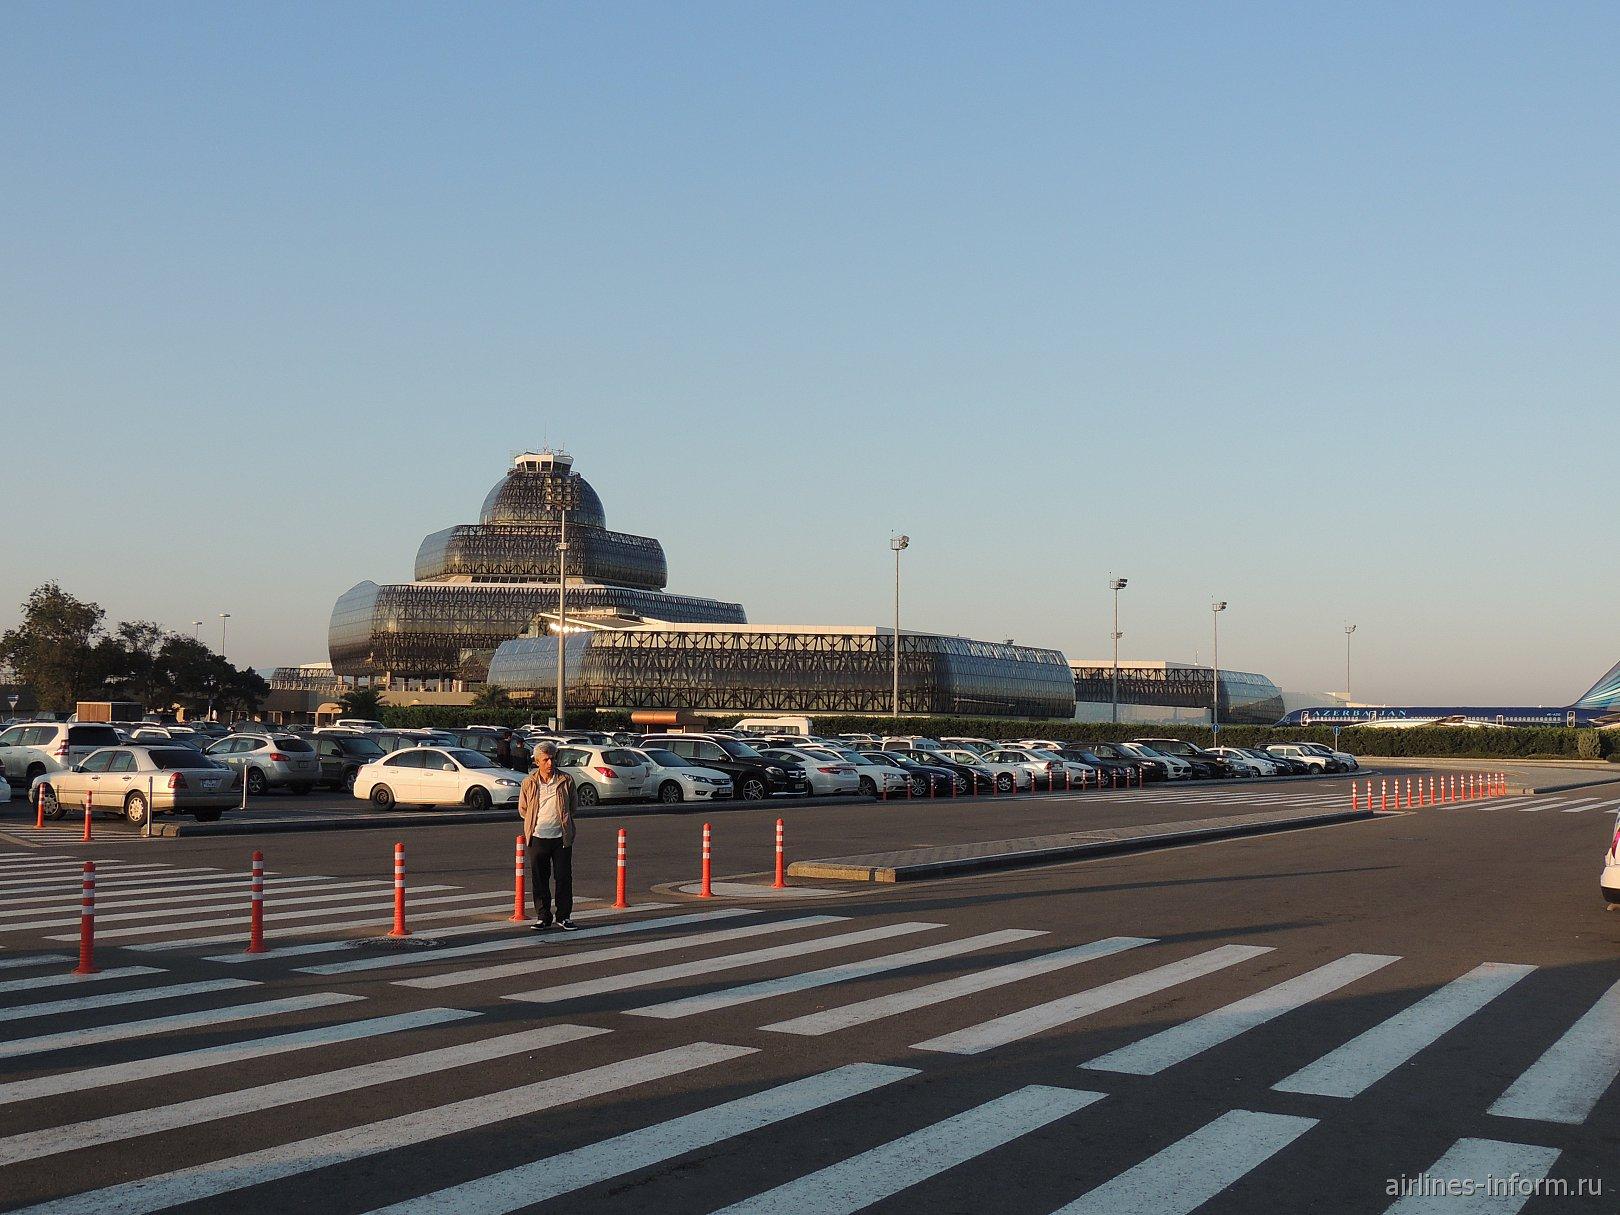 Терминал 2 аэропорта Баку имени Гейдара Алиева